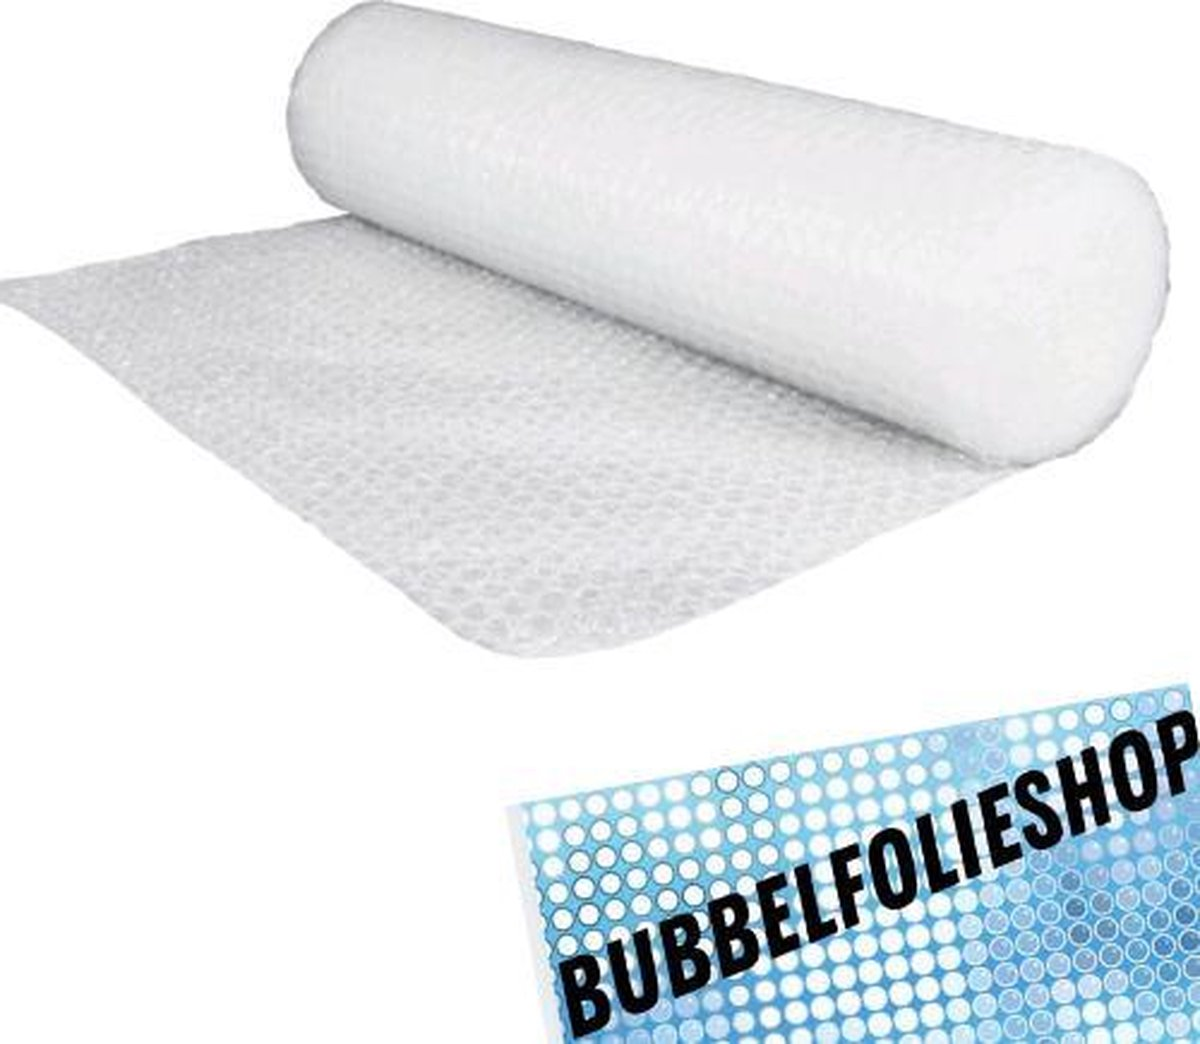 Bubbel Folie   Bubbeltjesplastic   Noppen Folie   50cm x 5m   Bubbel Wrap